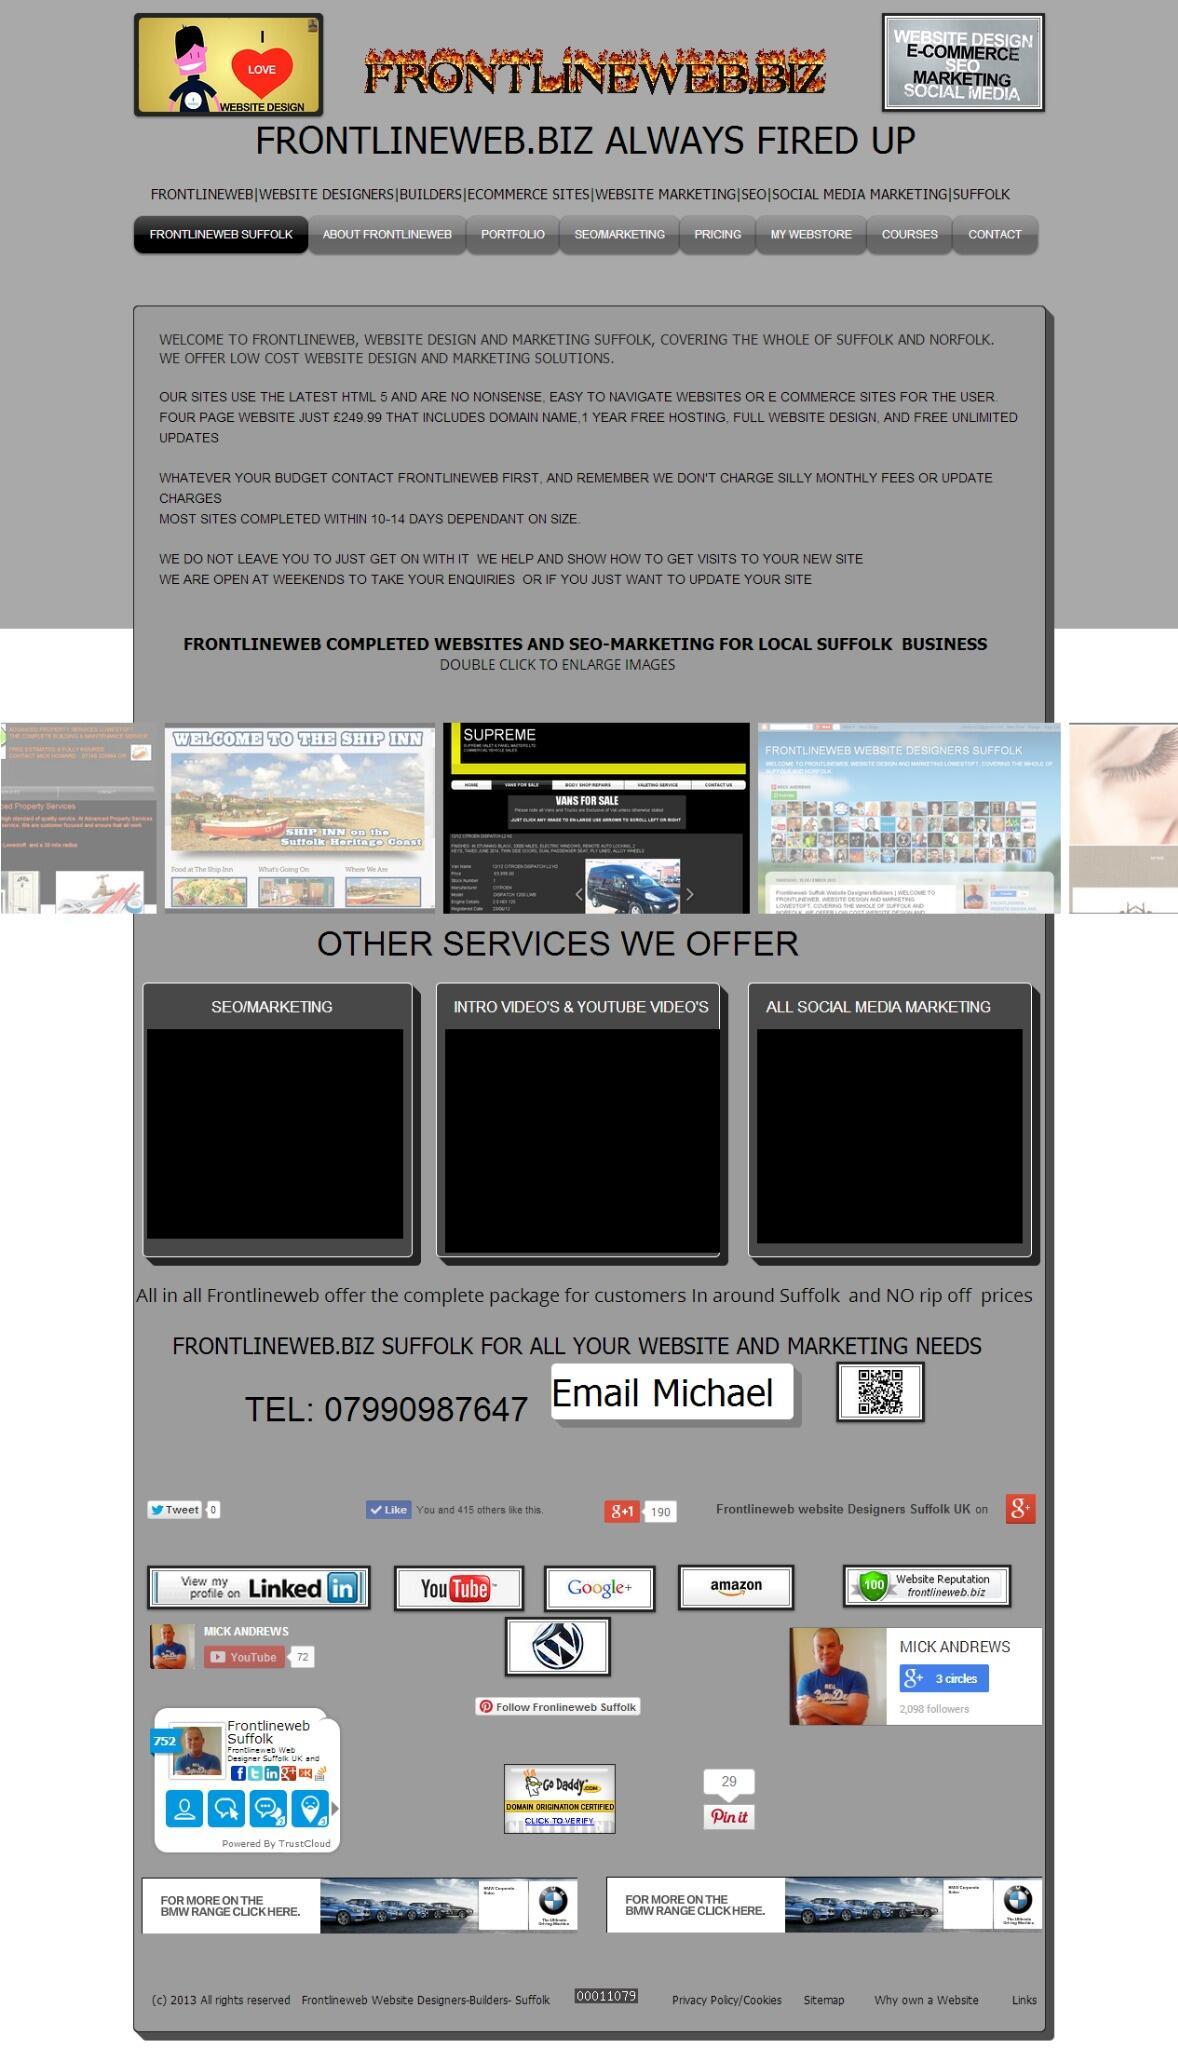 Embedded image permalink